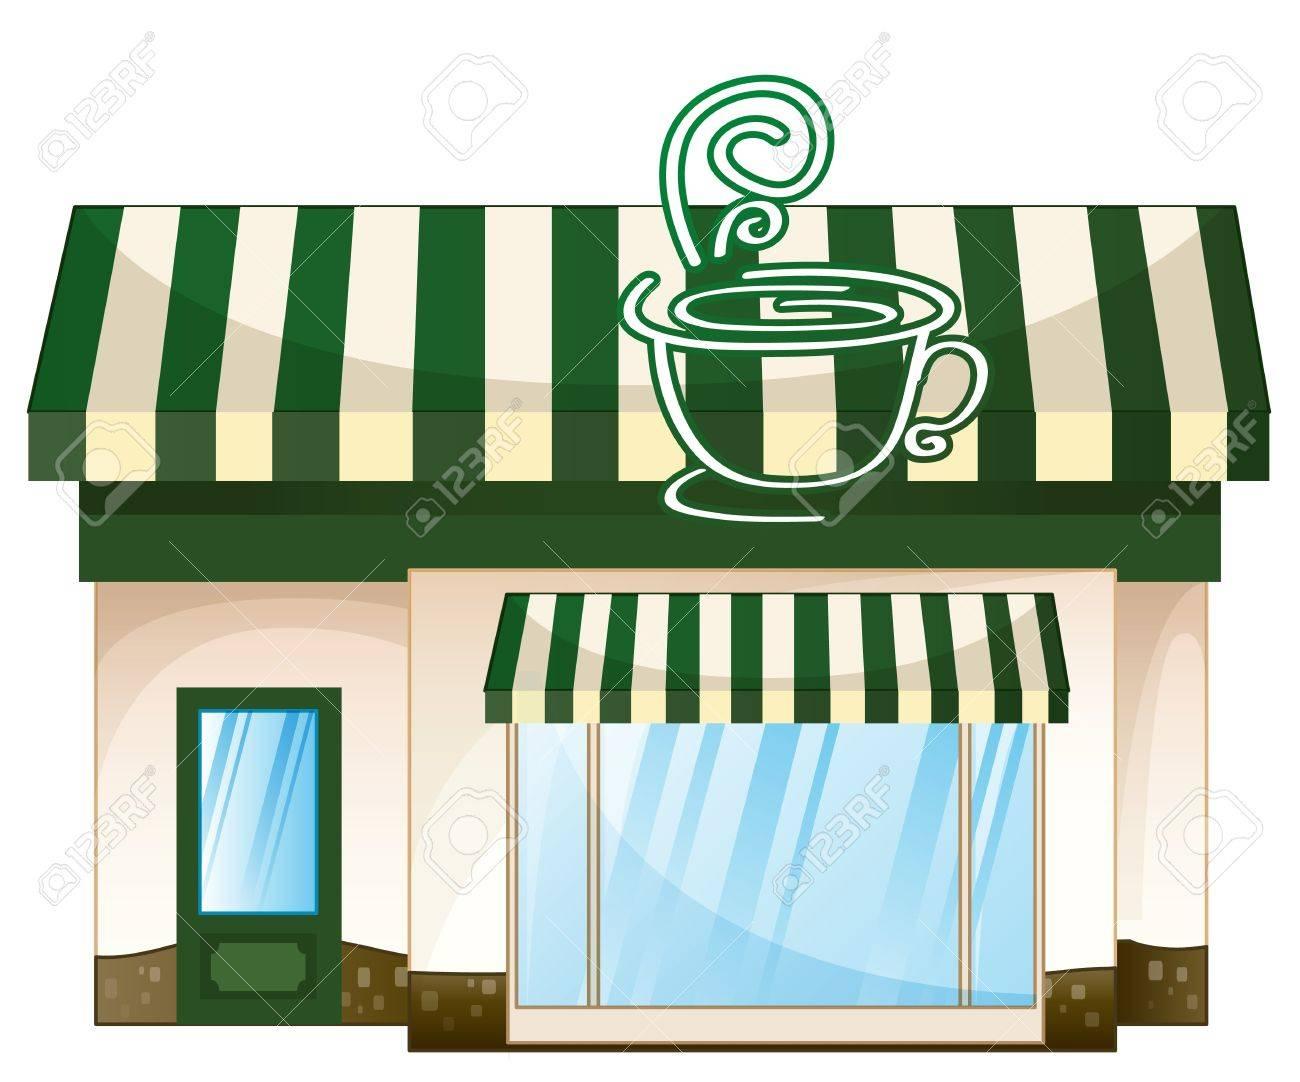 Fancy restaurant buildings clip art - Restaurant Building Illustration Of A Tent House On A White Background Illustration